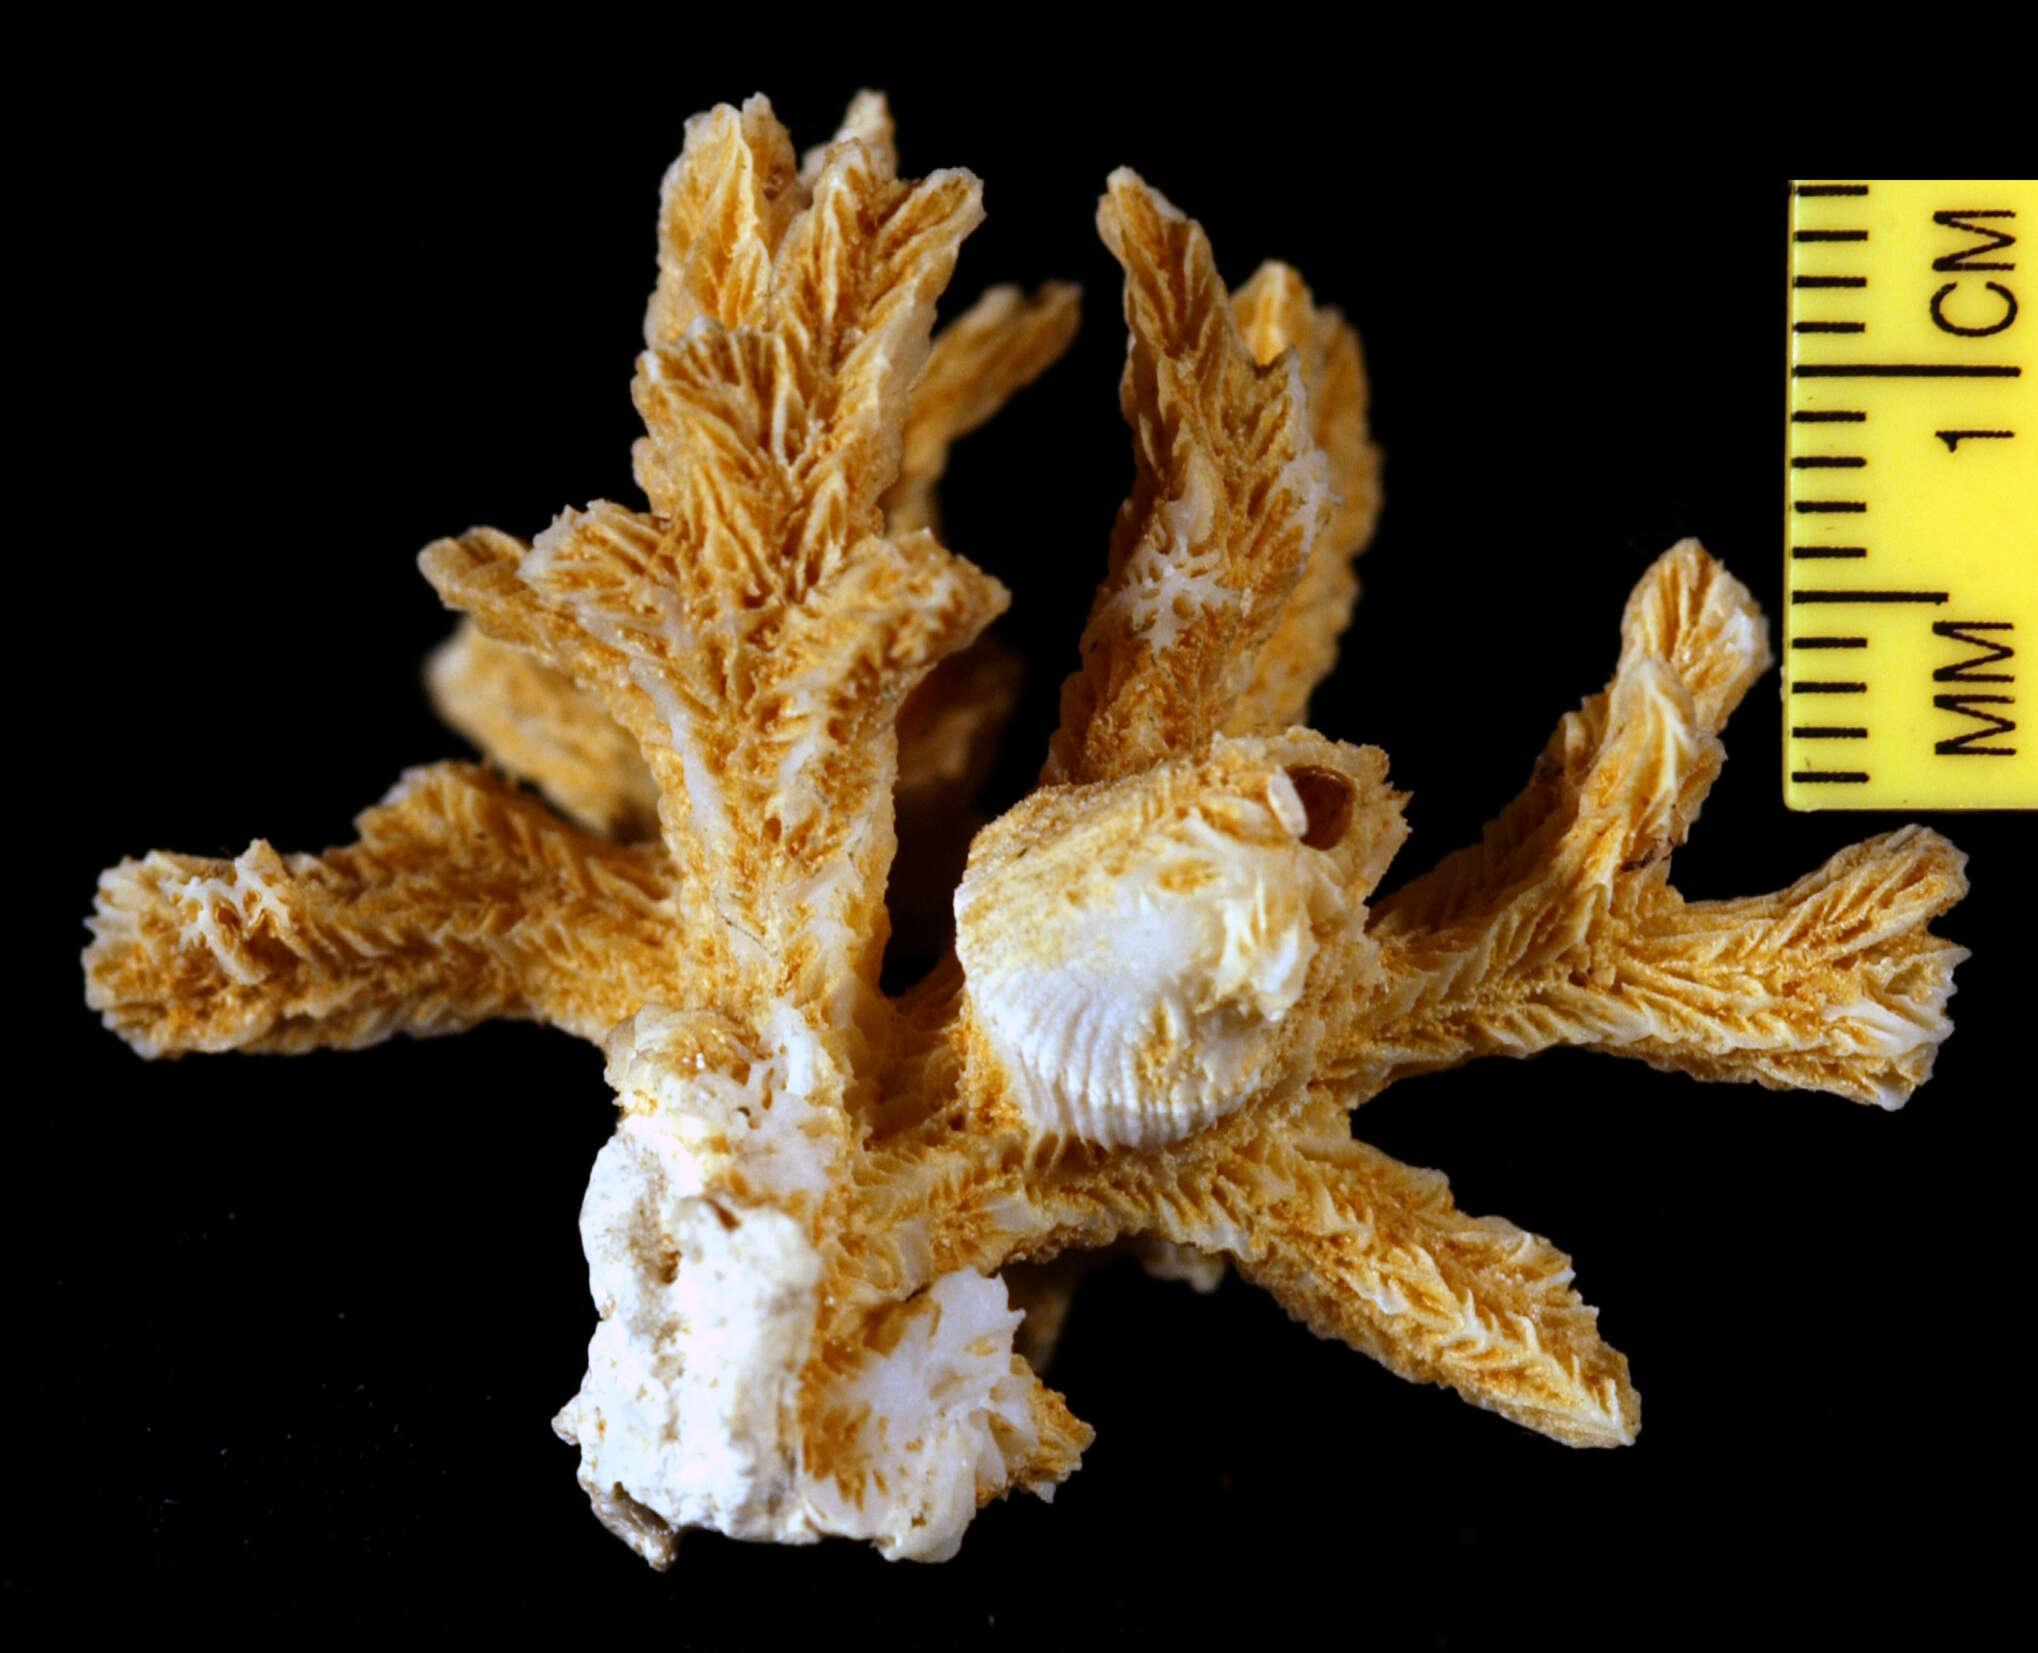 Image of Hydnophora